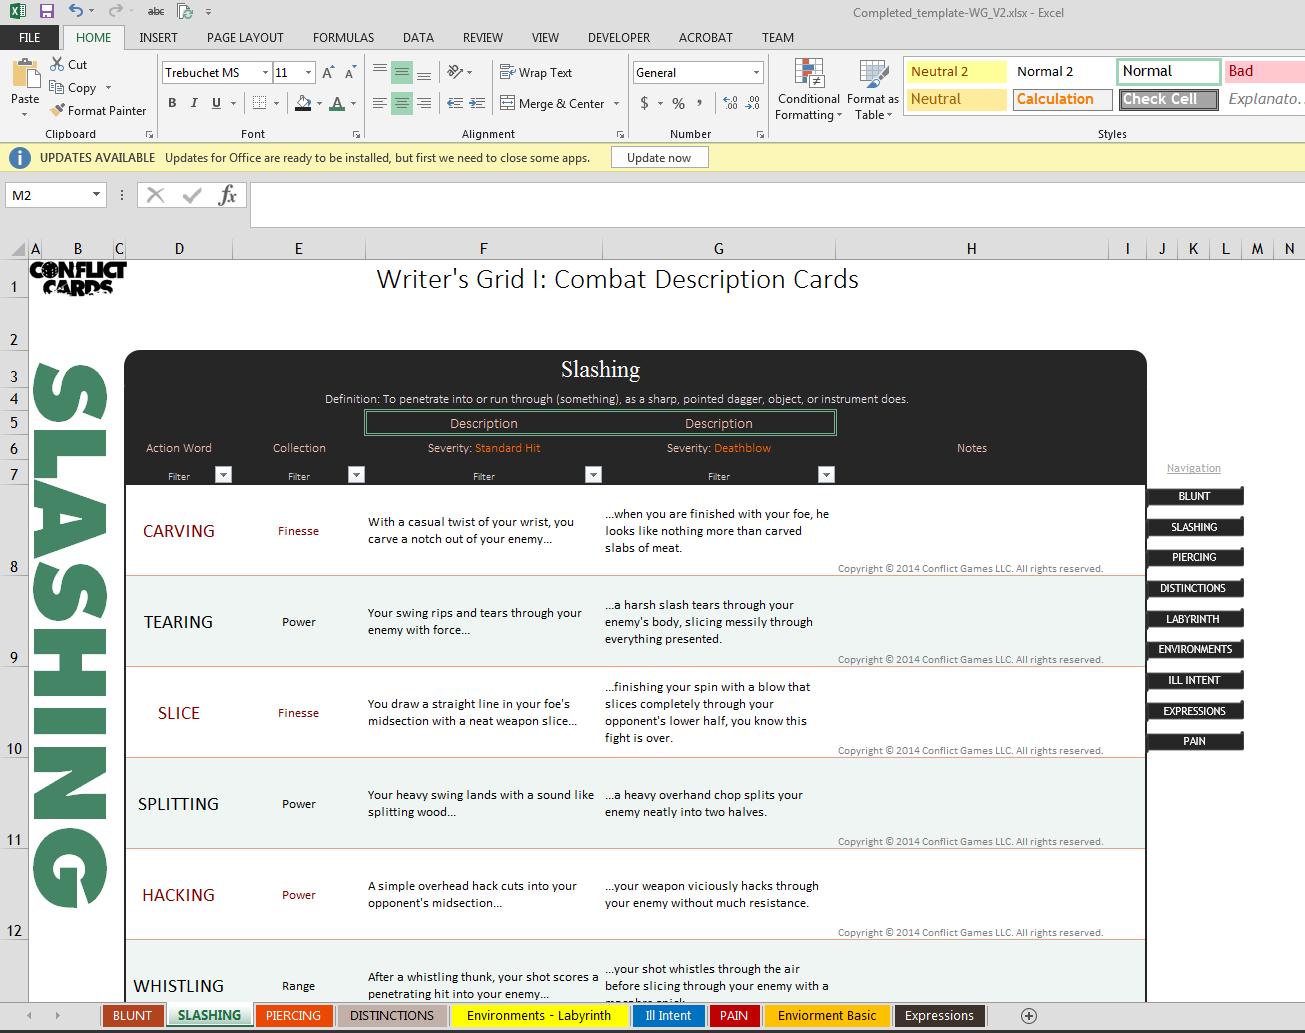 Screenshot of Combat Description Cards and Storyteller's deck in excel